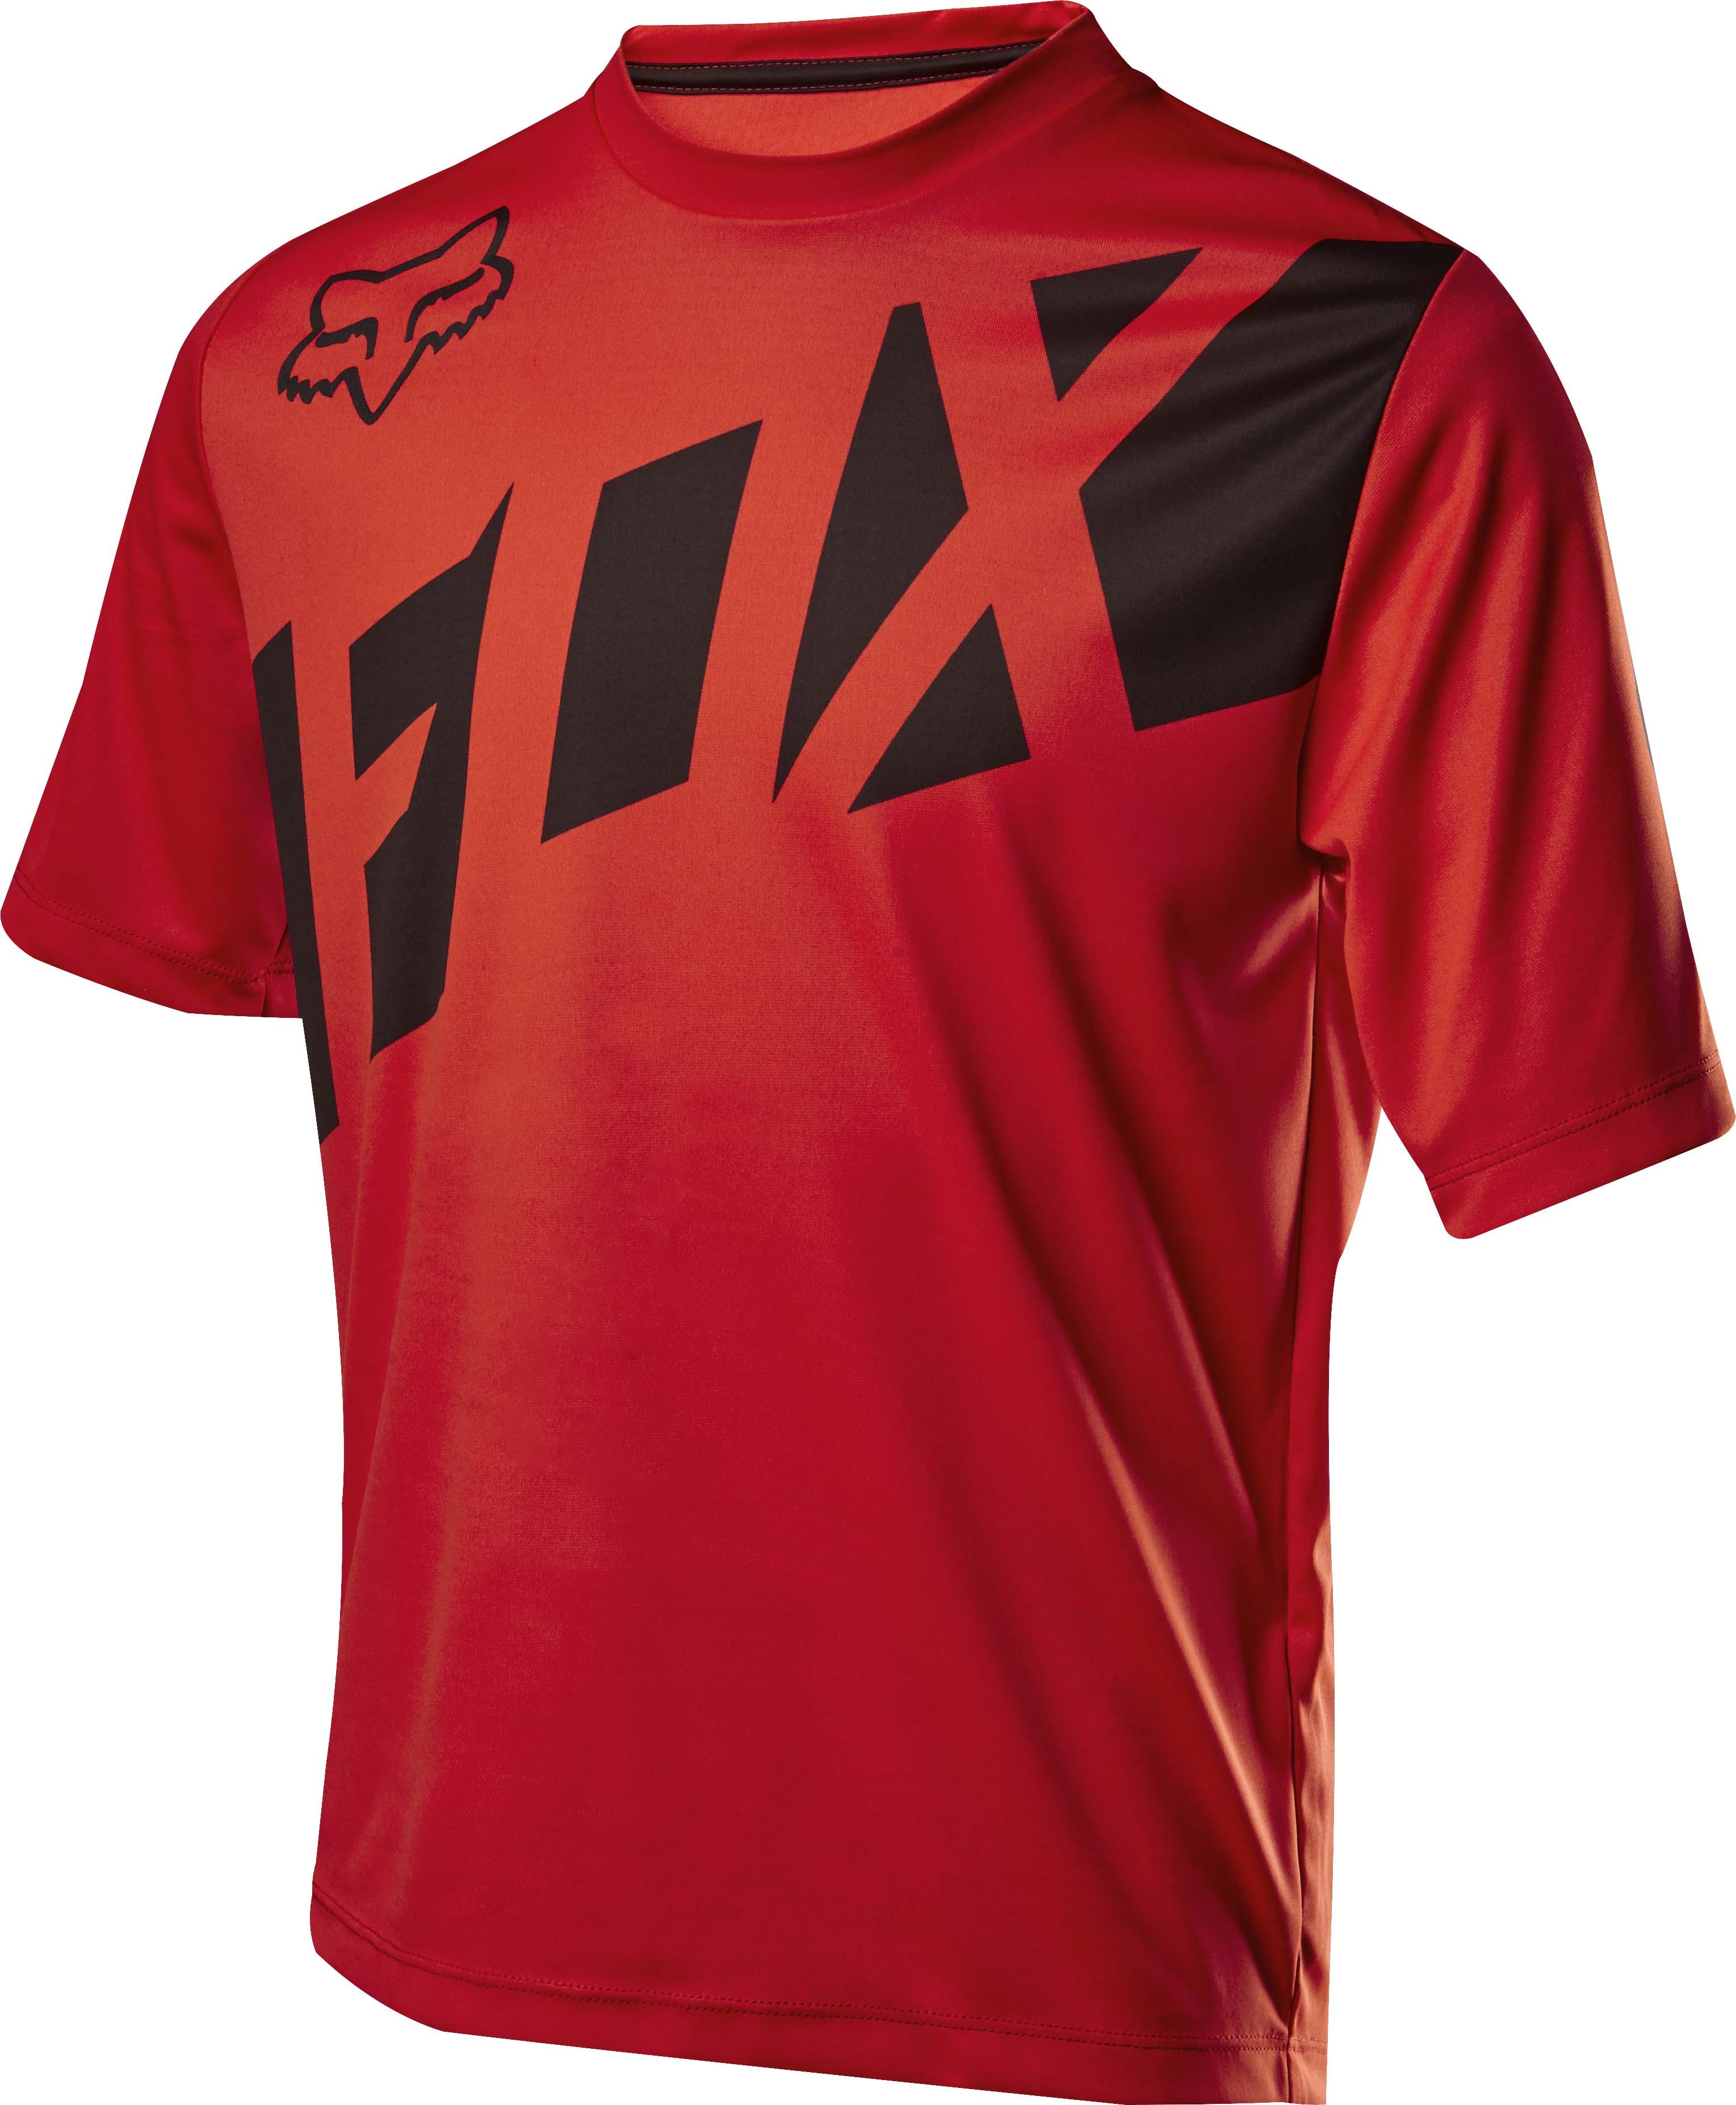 Fox Ranger Shirt SS Jersey Red Black Red Black MTB Mountain Bike Casual